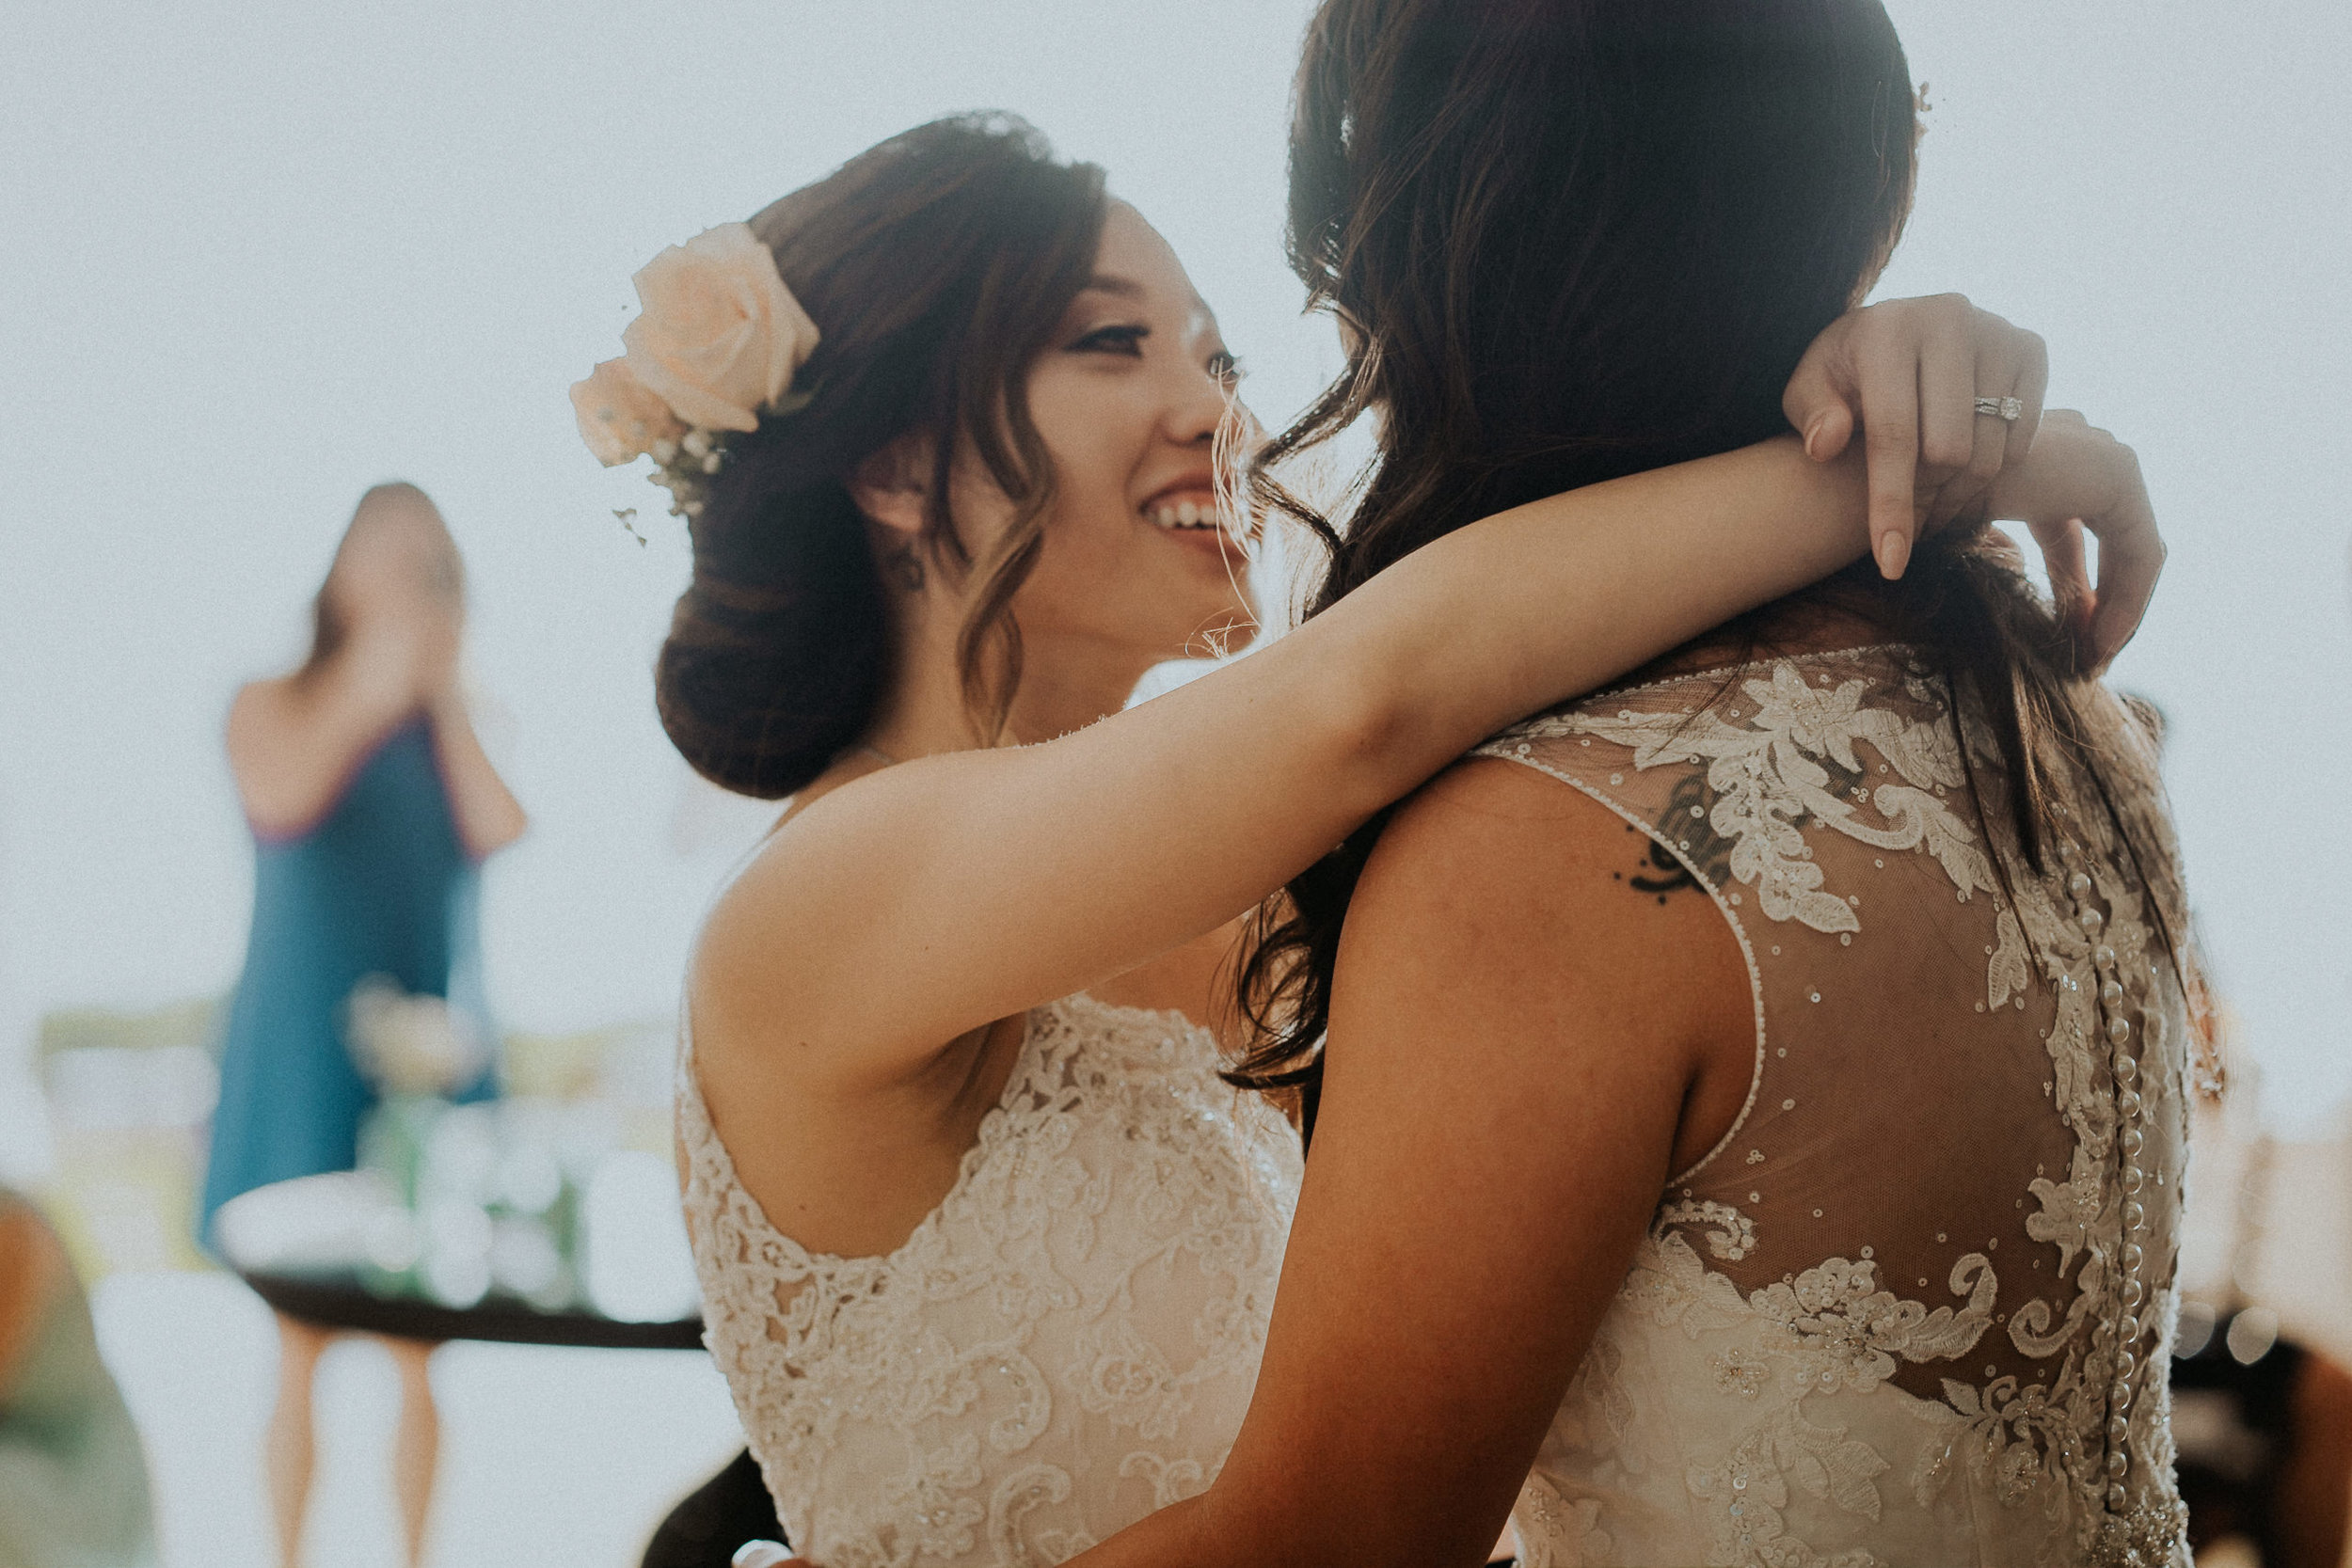 Maui_Destination_wedding_Alfred_Tang-40.jpg